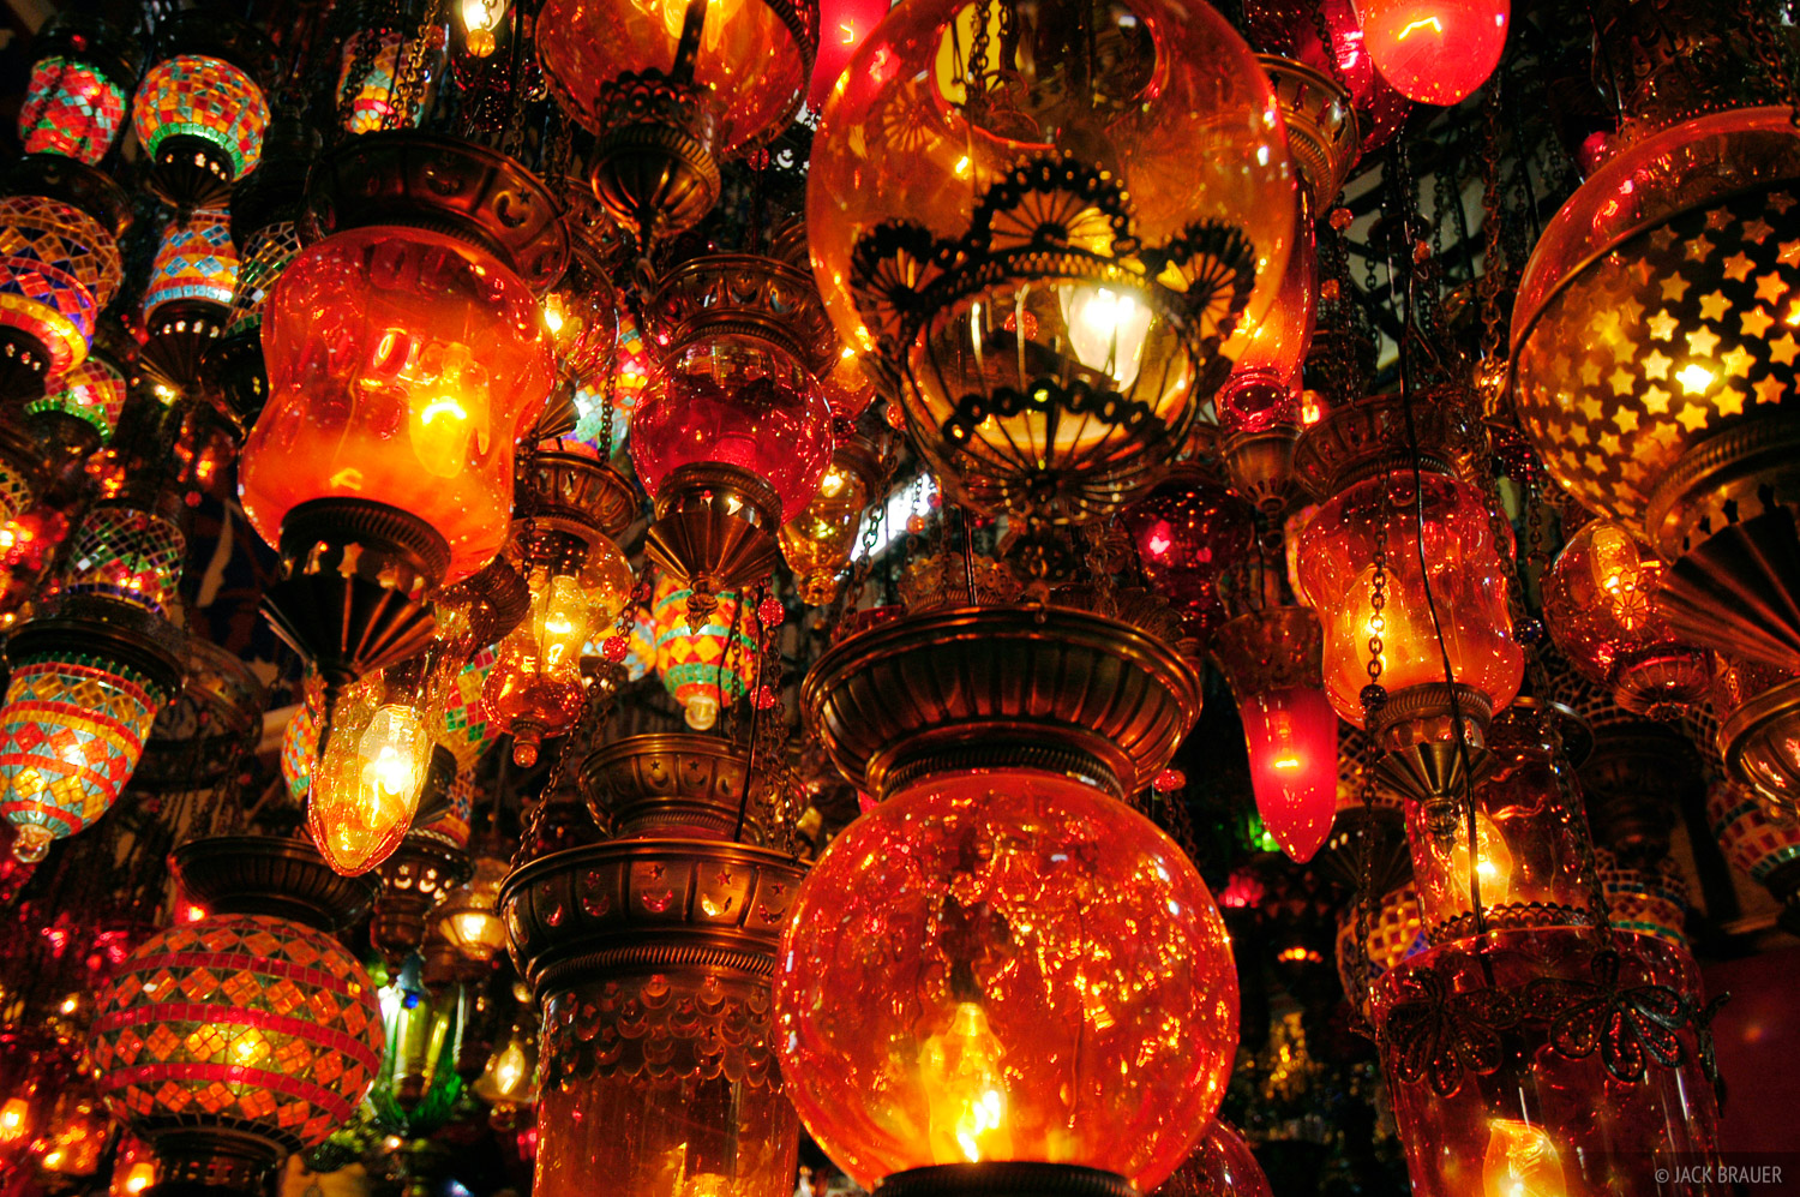 lamps, Grand Bazaar, Istanbul, Turkey, photo